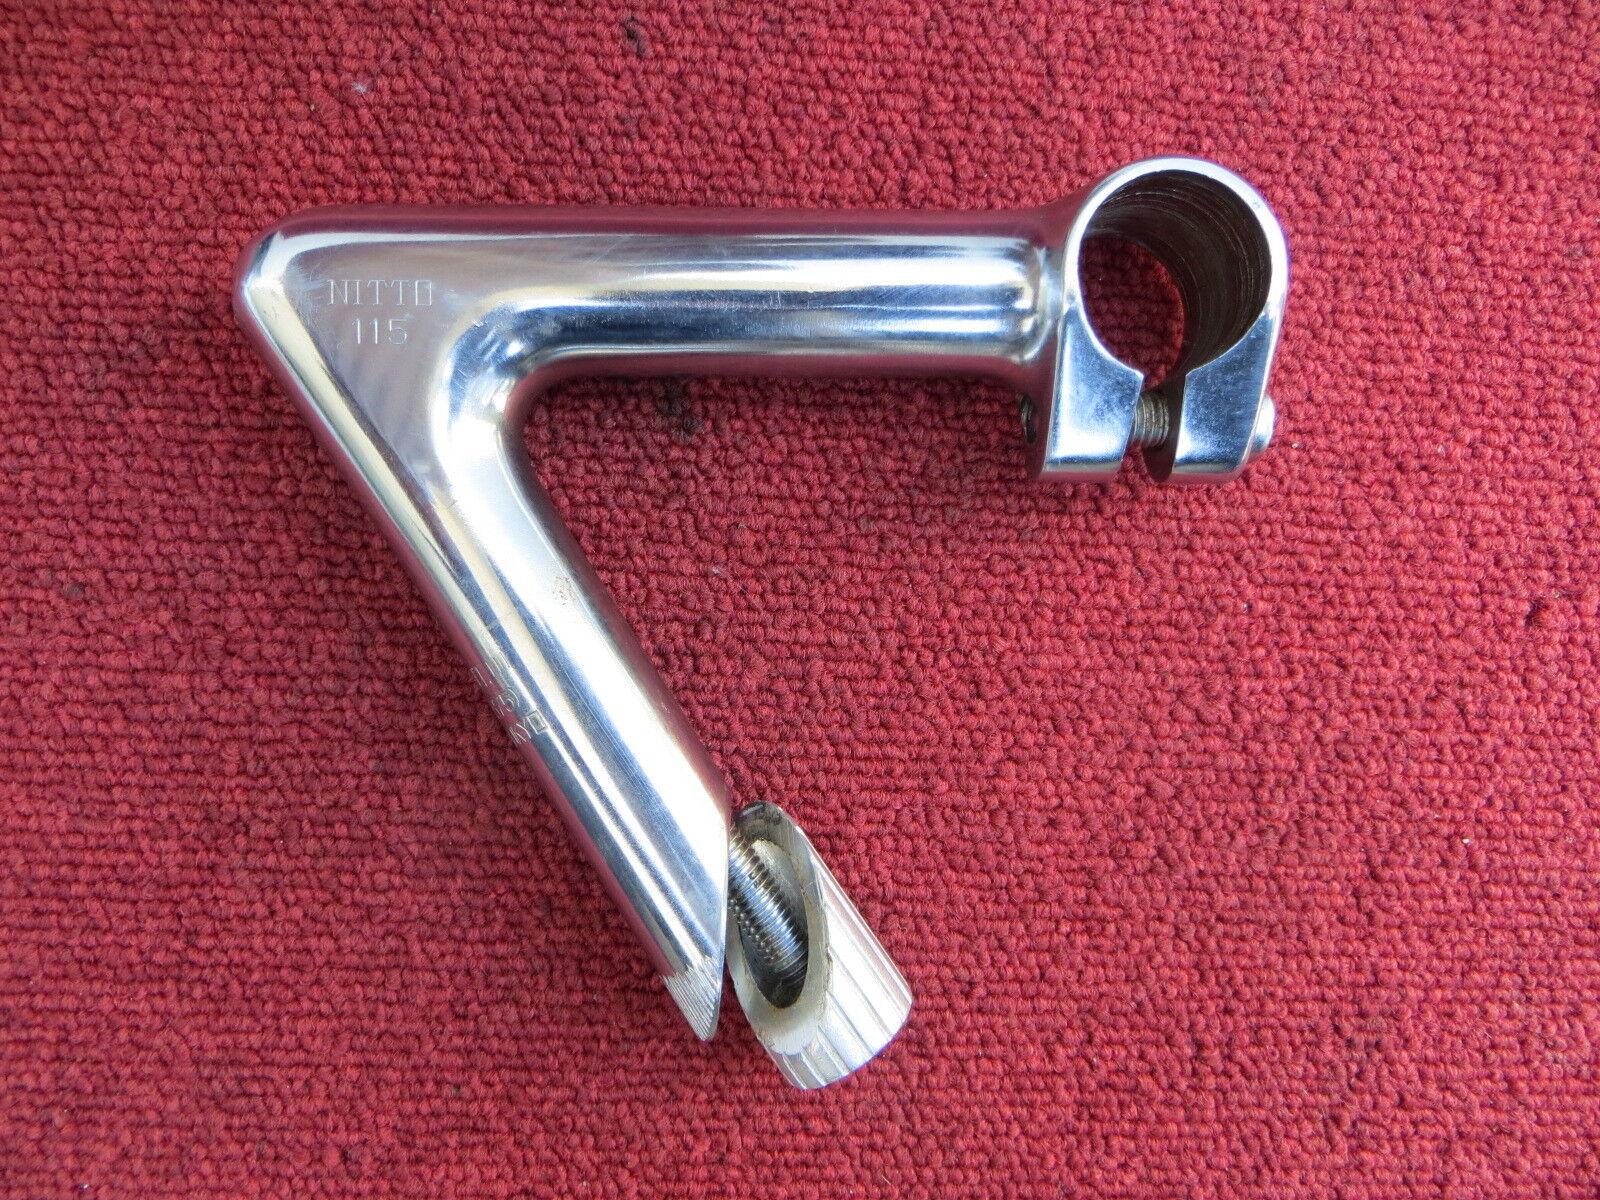 Nitto Jaguar 115mm 58Degree NJS Approved Steel Stem Fixed Gear (18102012)